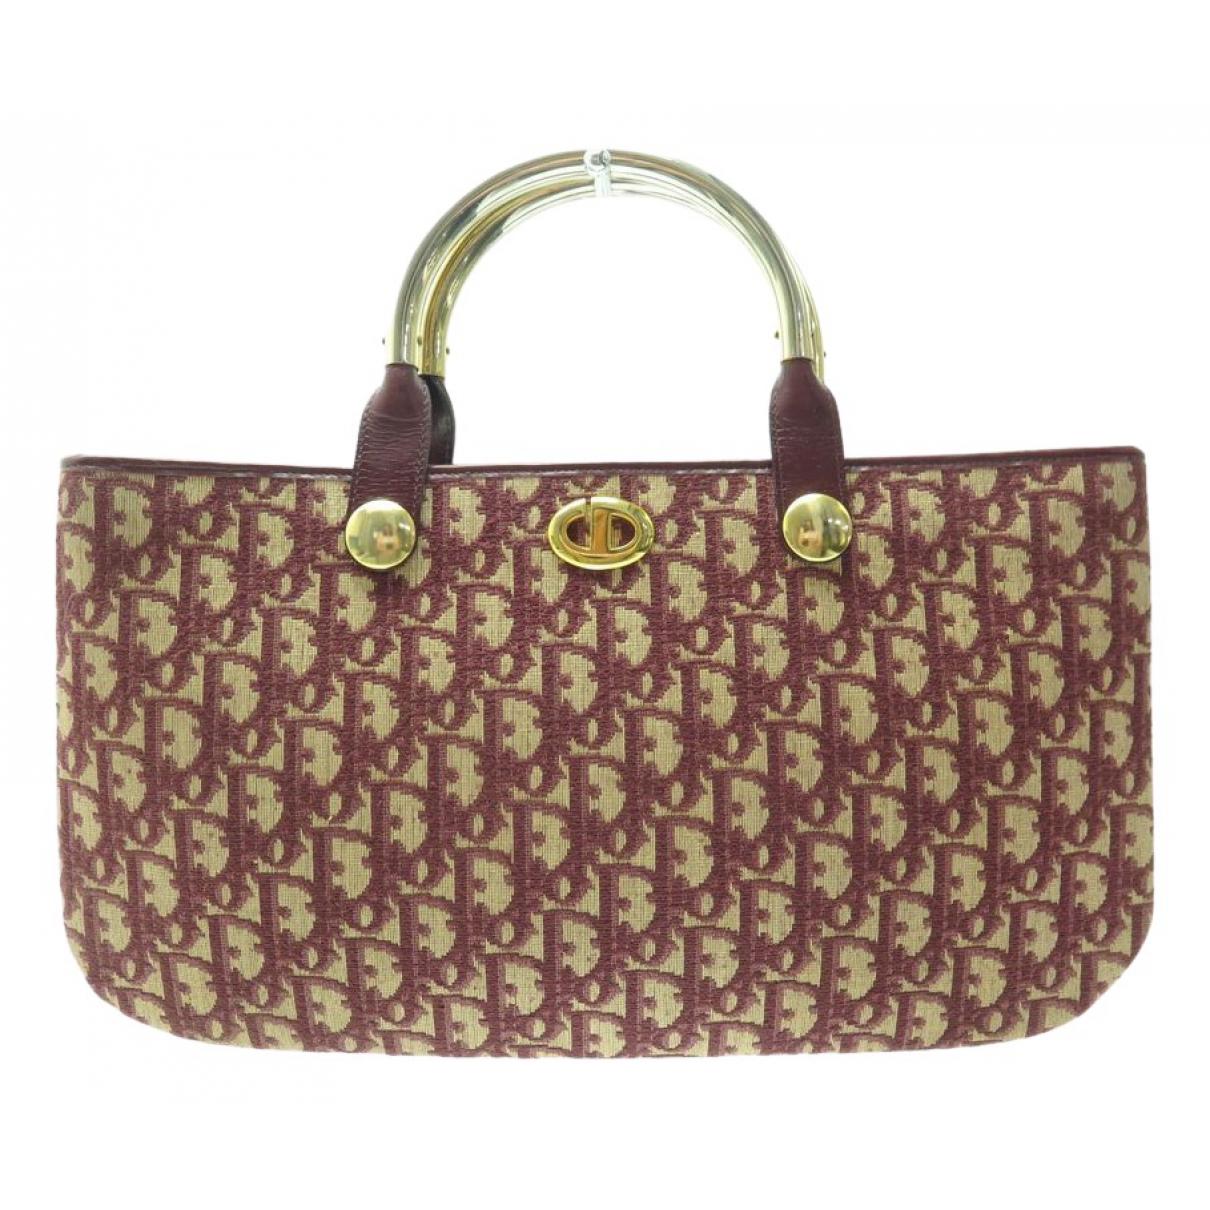 Dior \N Handtasche in  Bordeauxrot Leinen